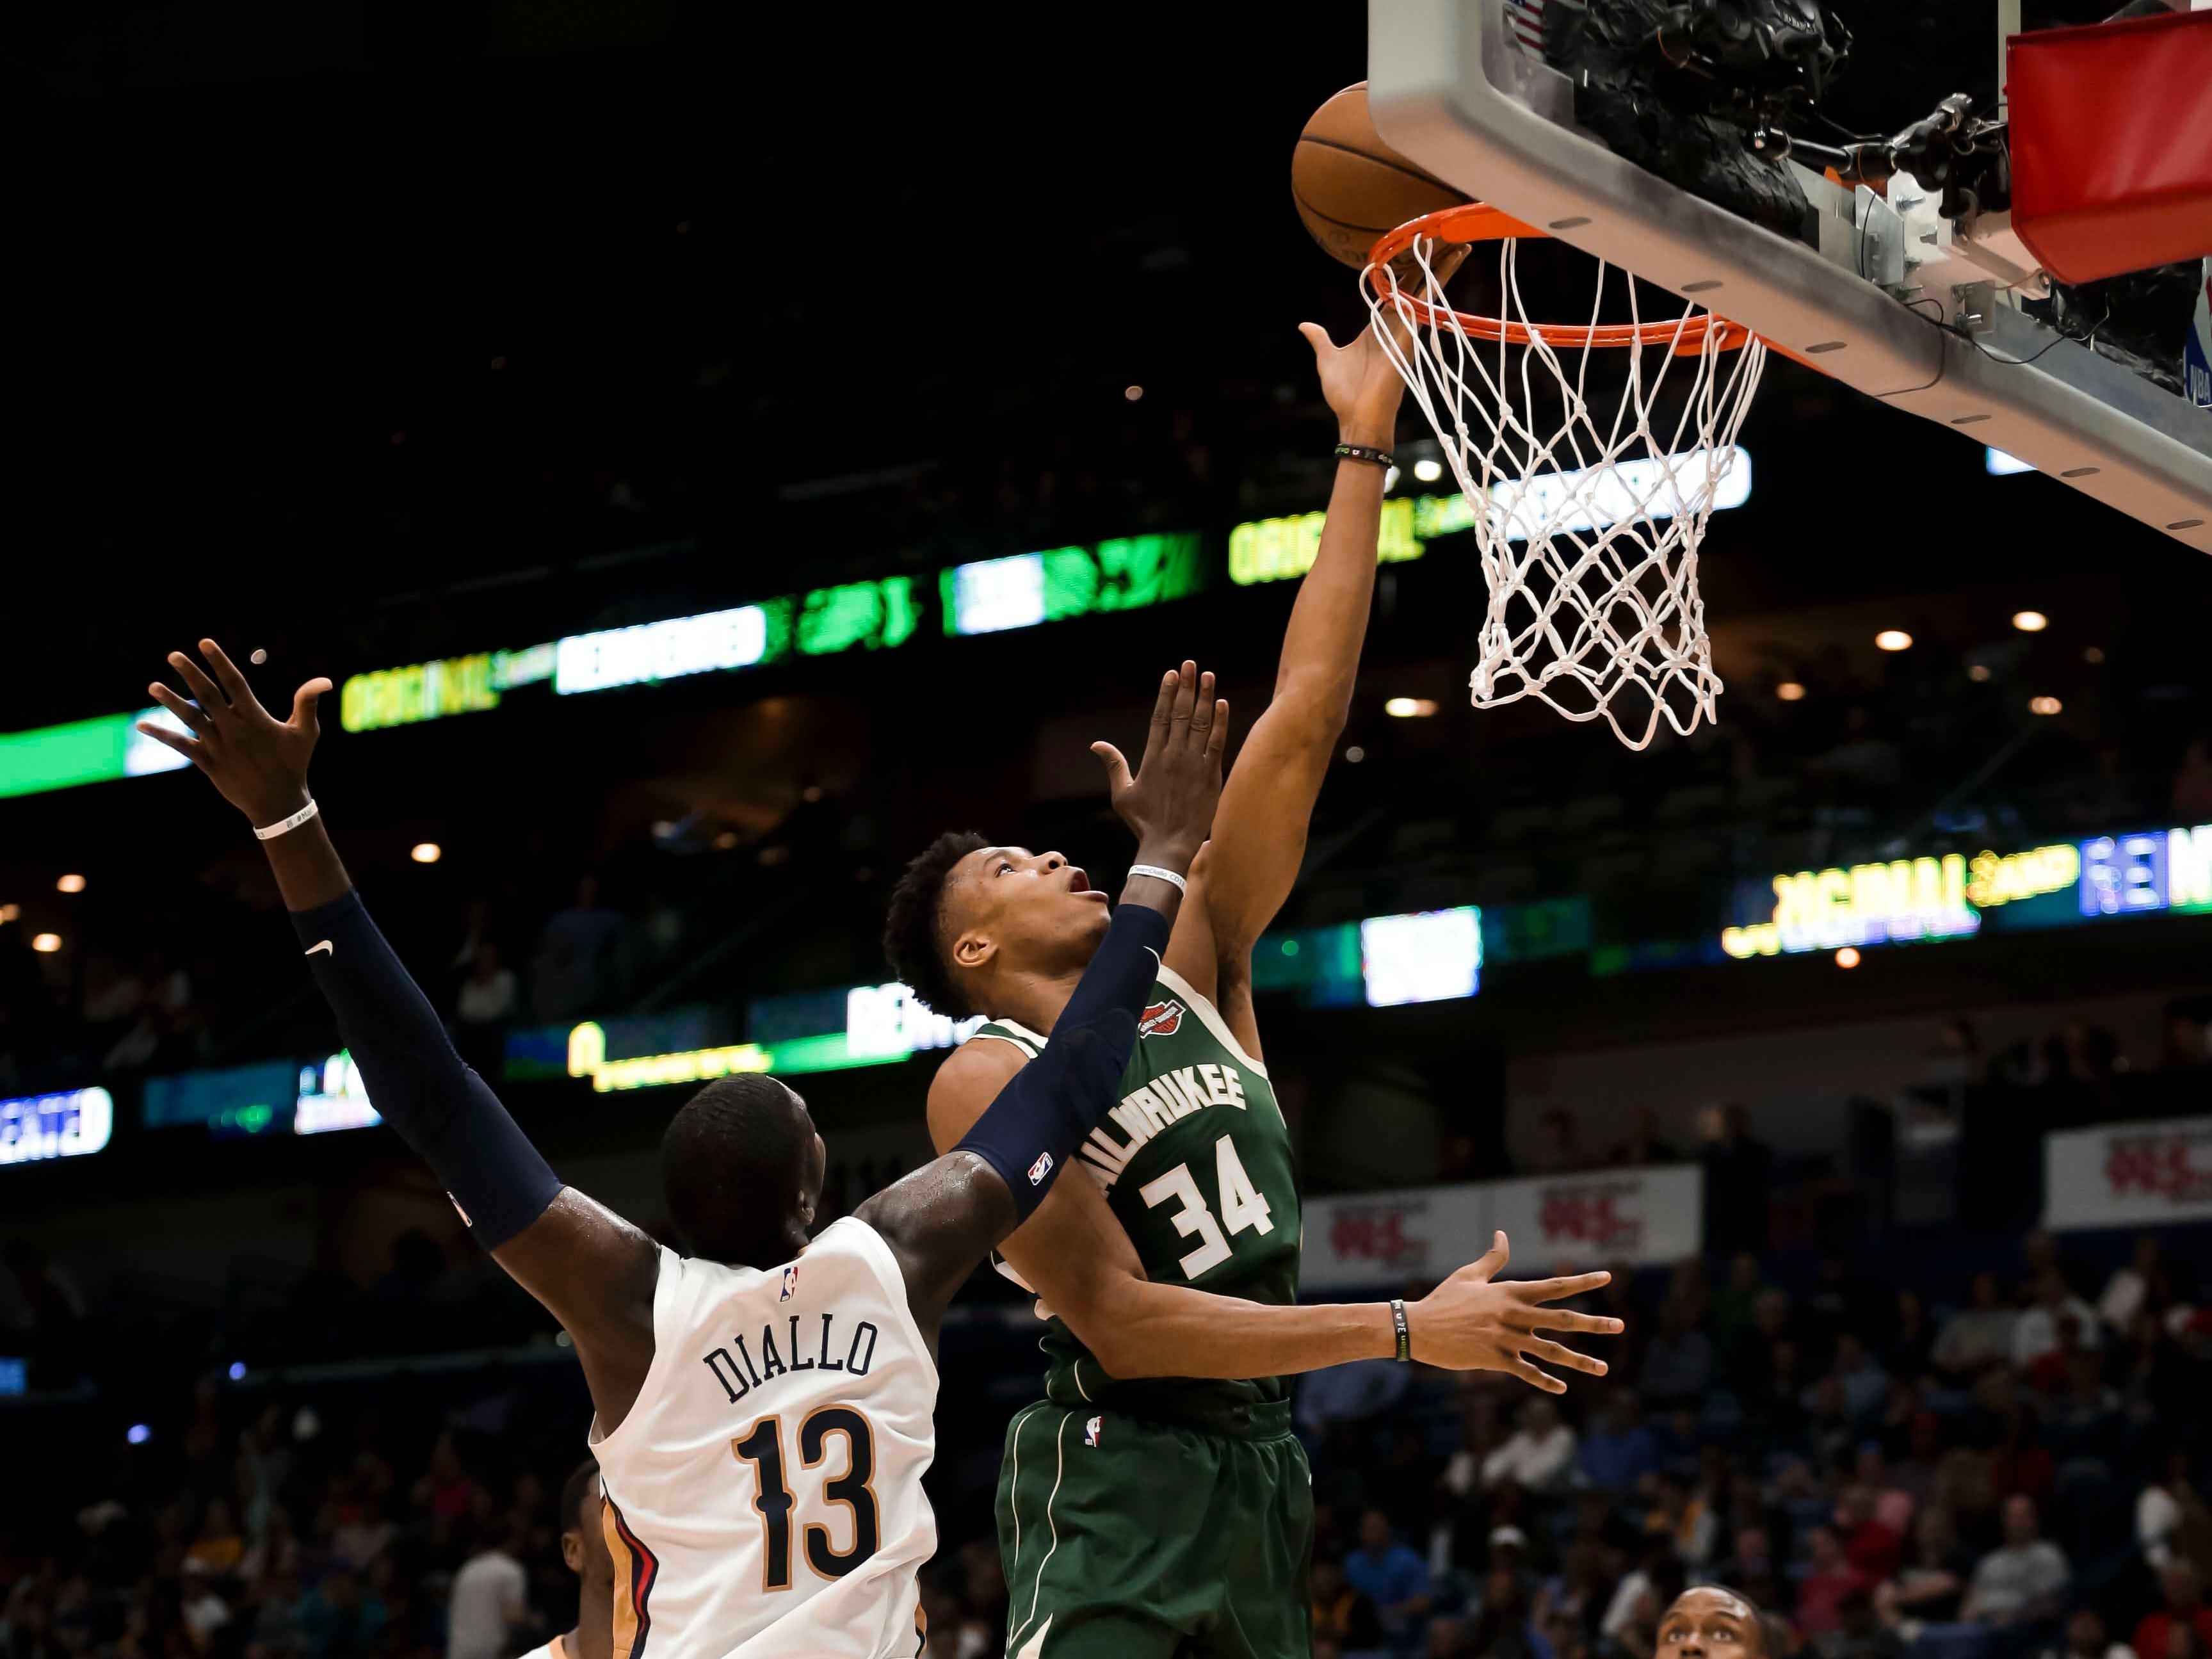 Bucks forward Giannis Antetokounmpo scores against Pelicans forward Cheick Diallo during the second half.